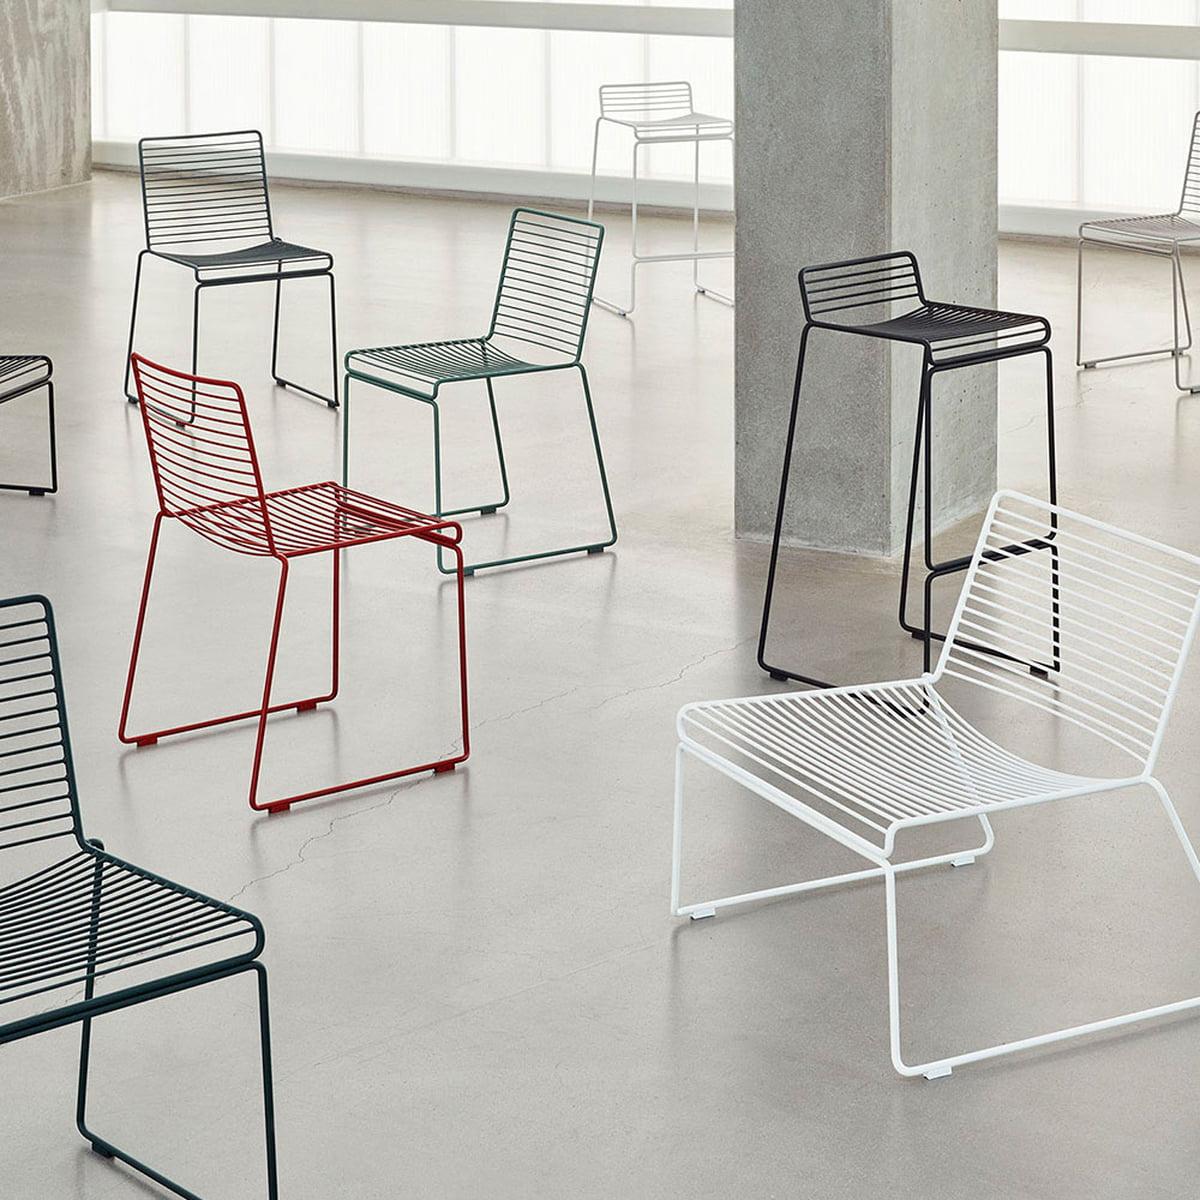 hee lounge chair von hay. Black Bedroom Furniture Sets. Home Design Ideas